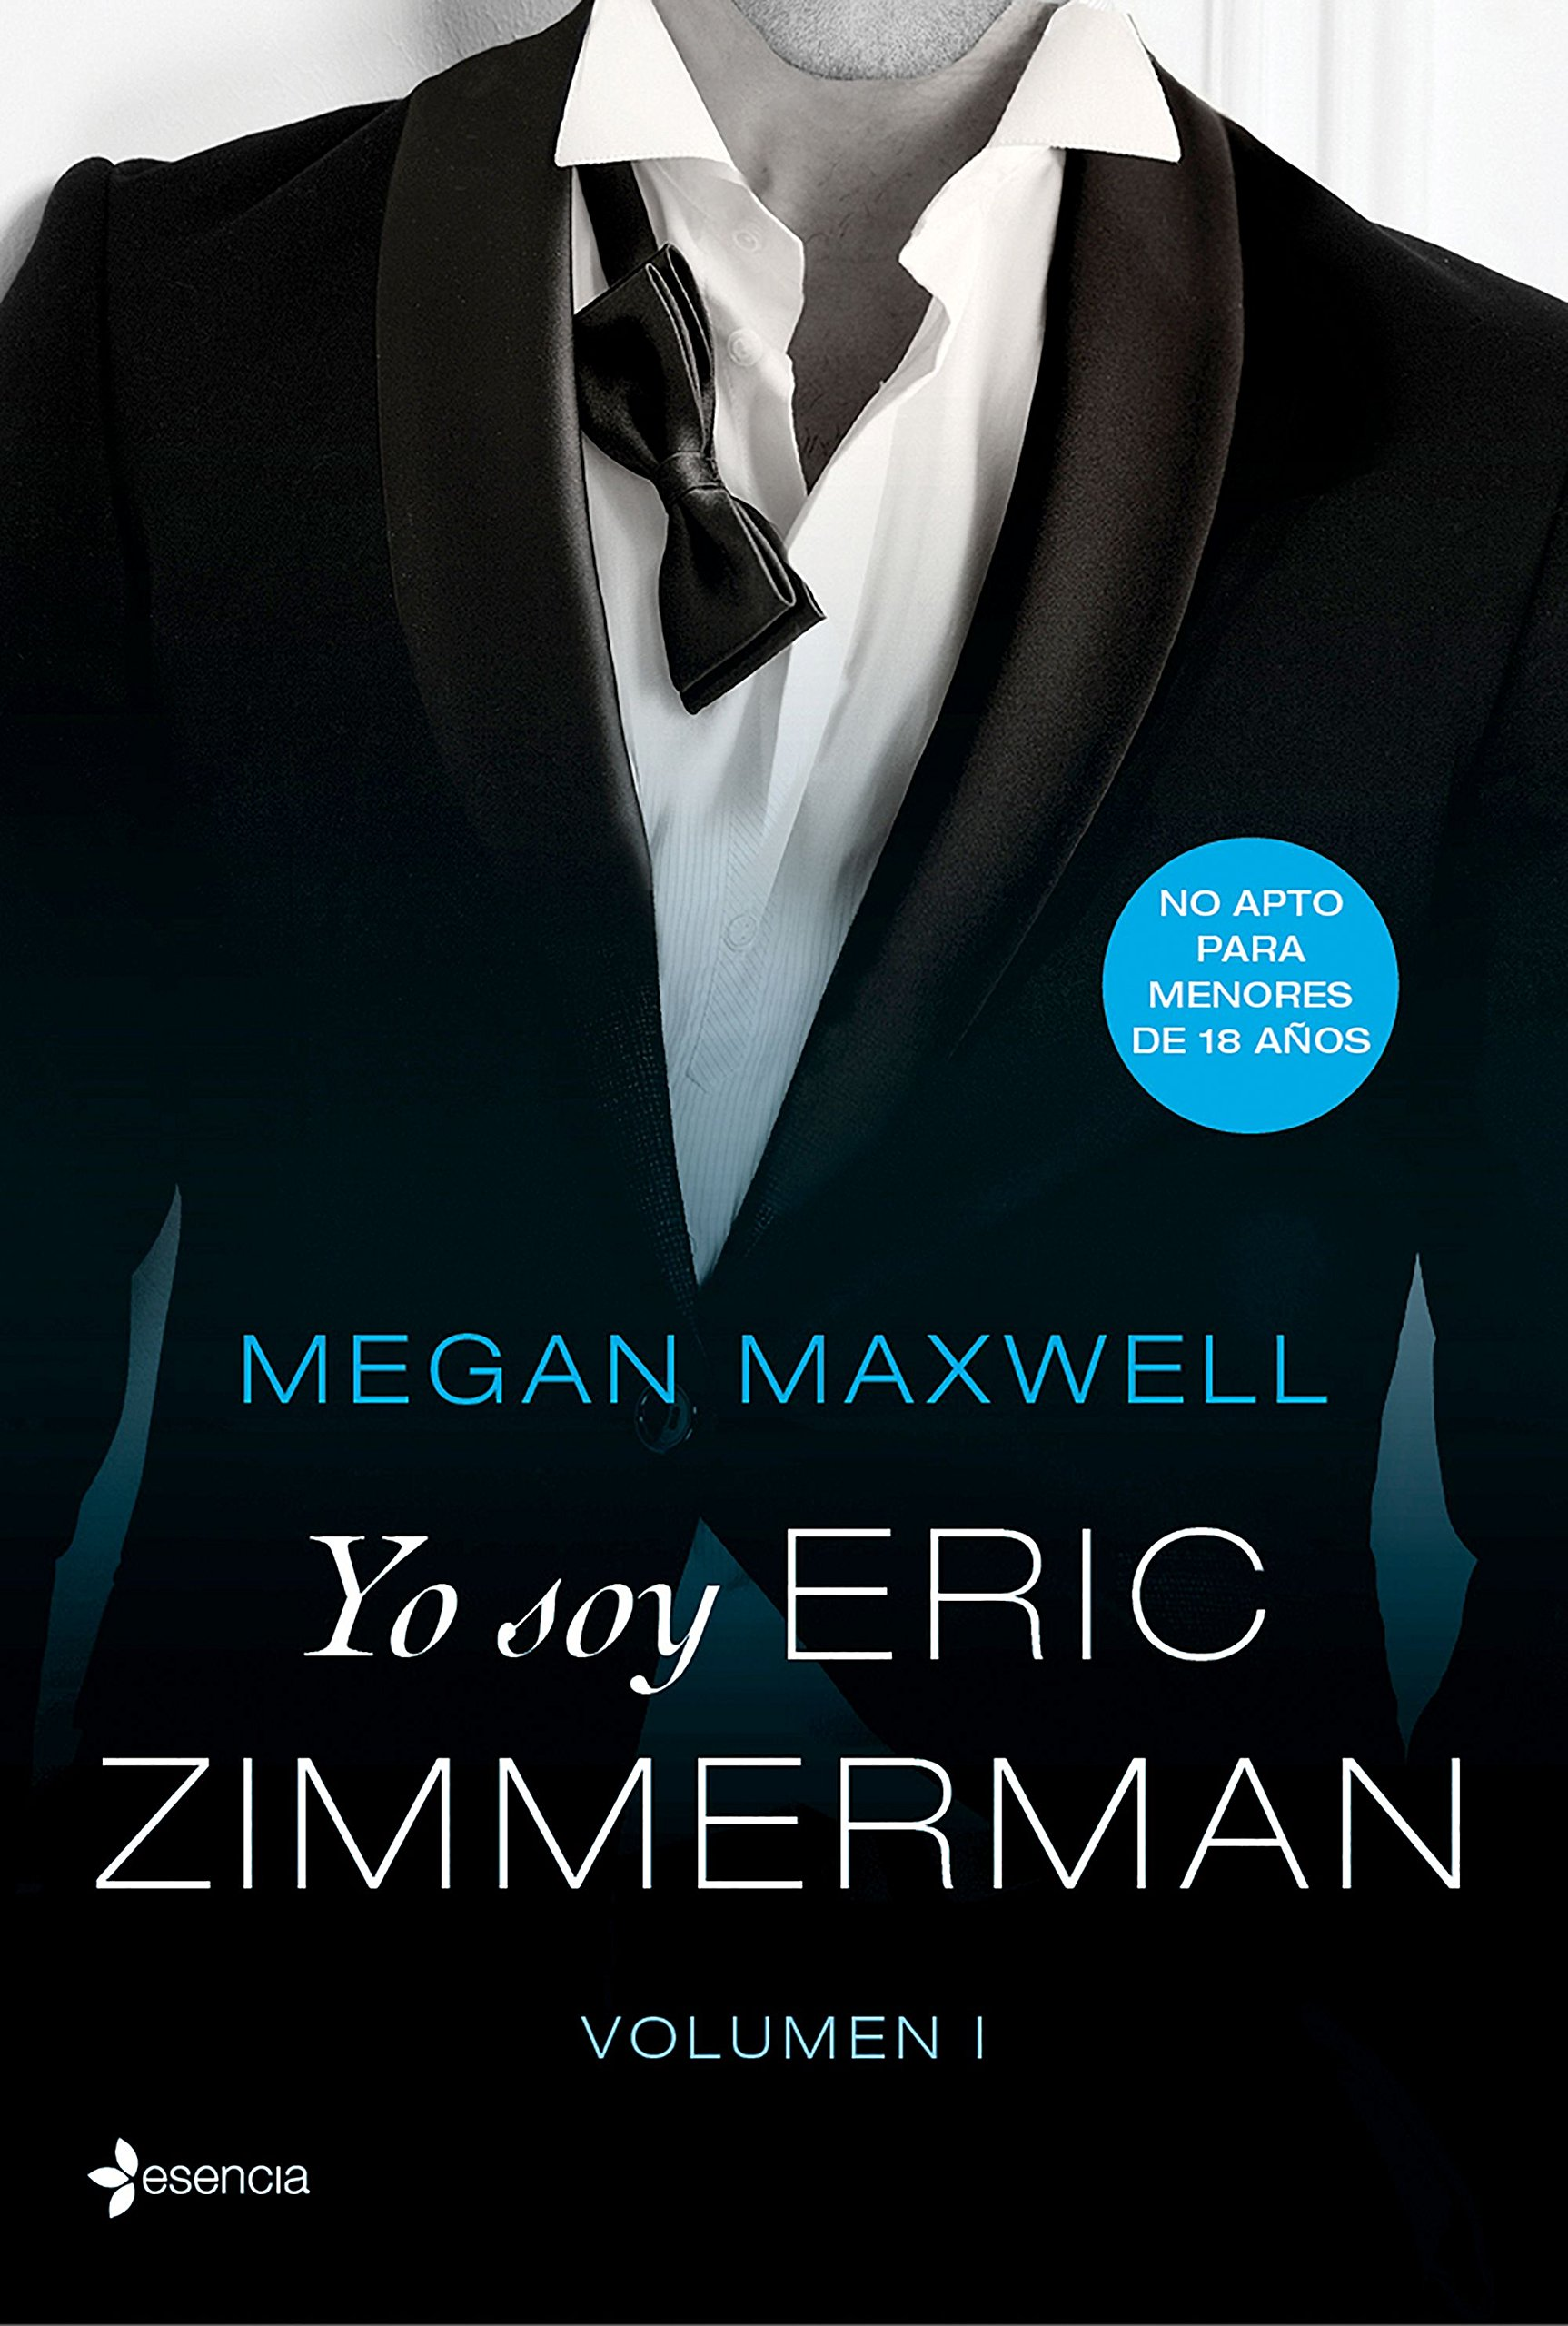 Yo soy Eric Zimmerman, vol. I (Erótica) Tapa blanda – 7 nov 2017 Megan Maxwell Esencia 8408177508 Erotic fiction